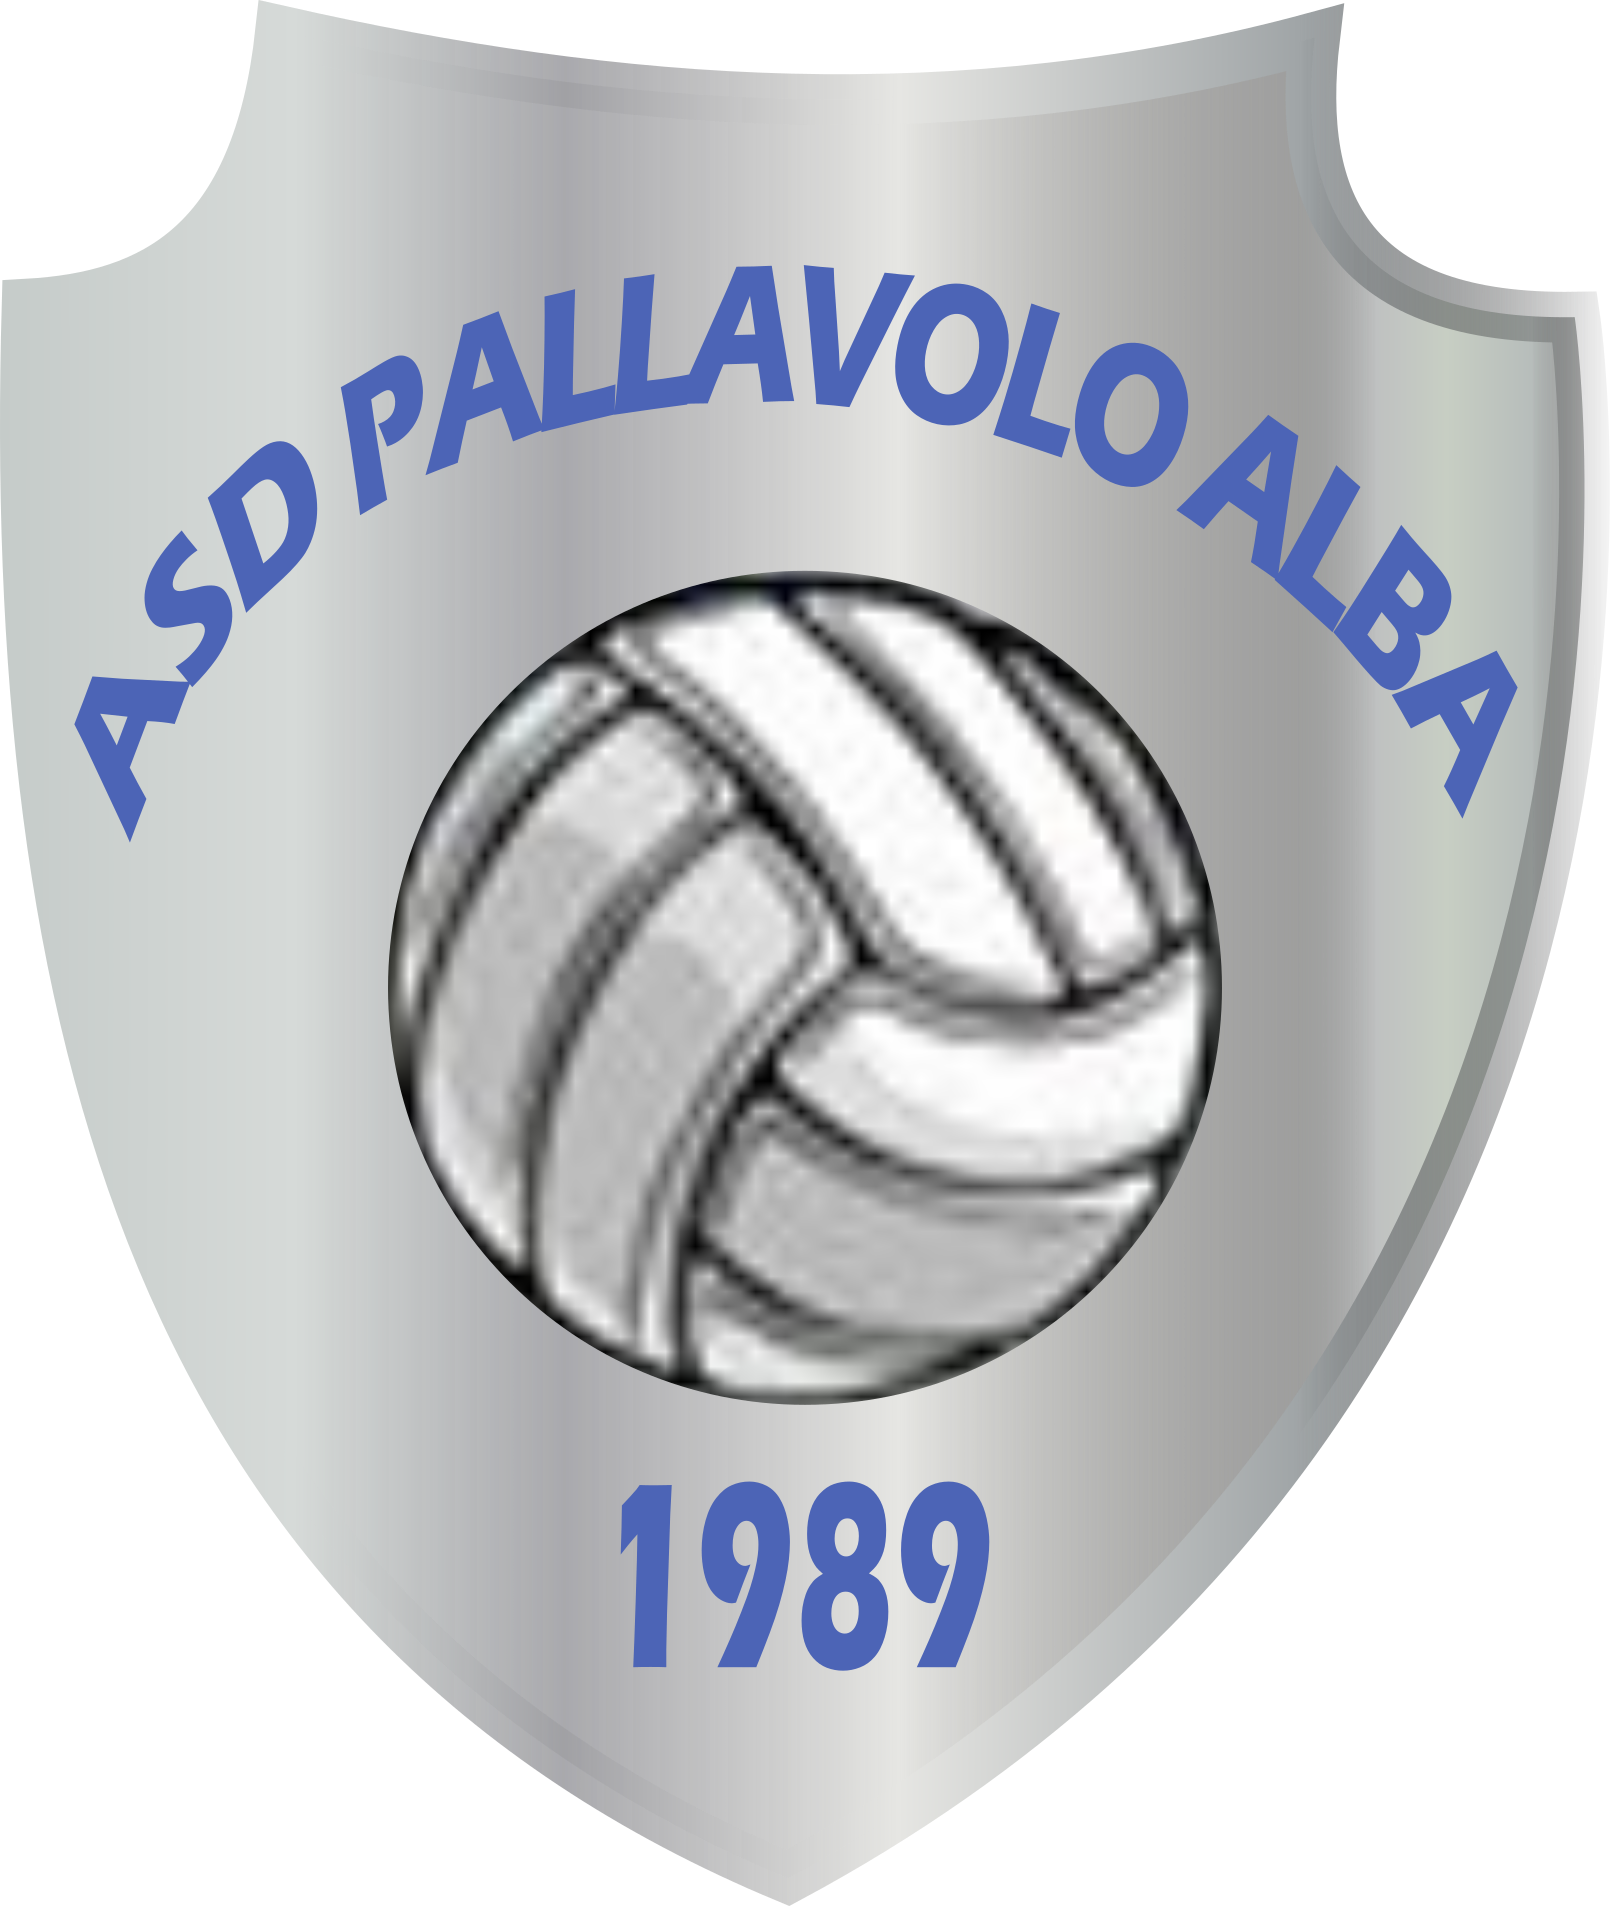 pallavolo-alba-logo